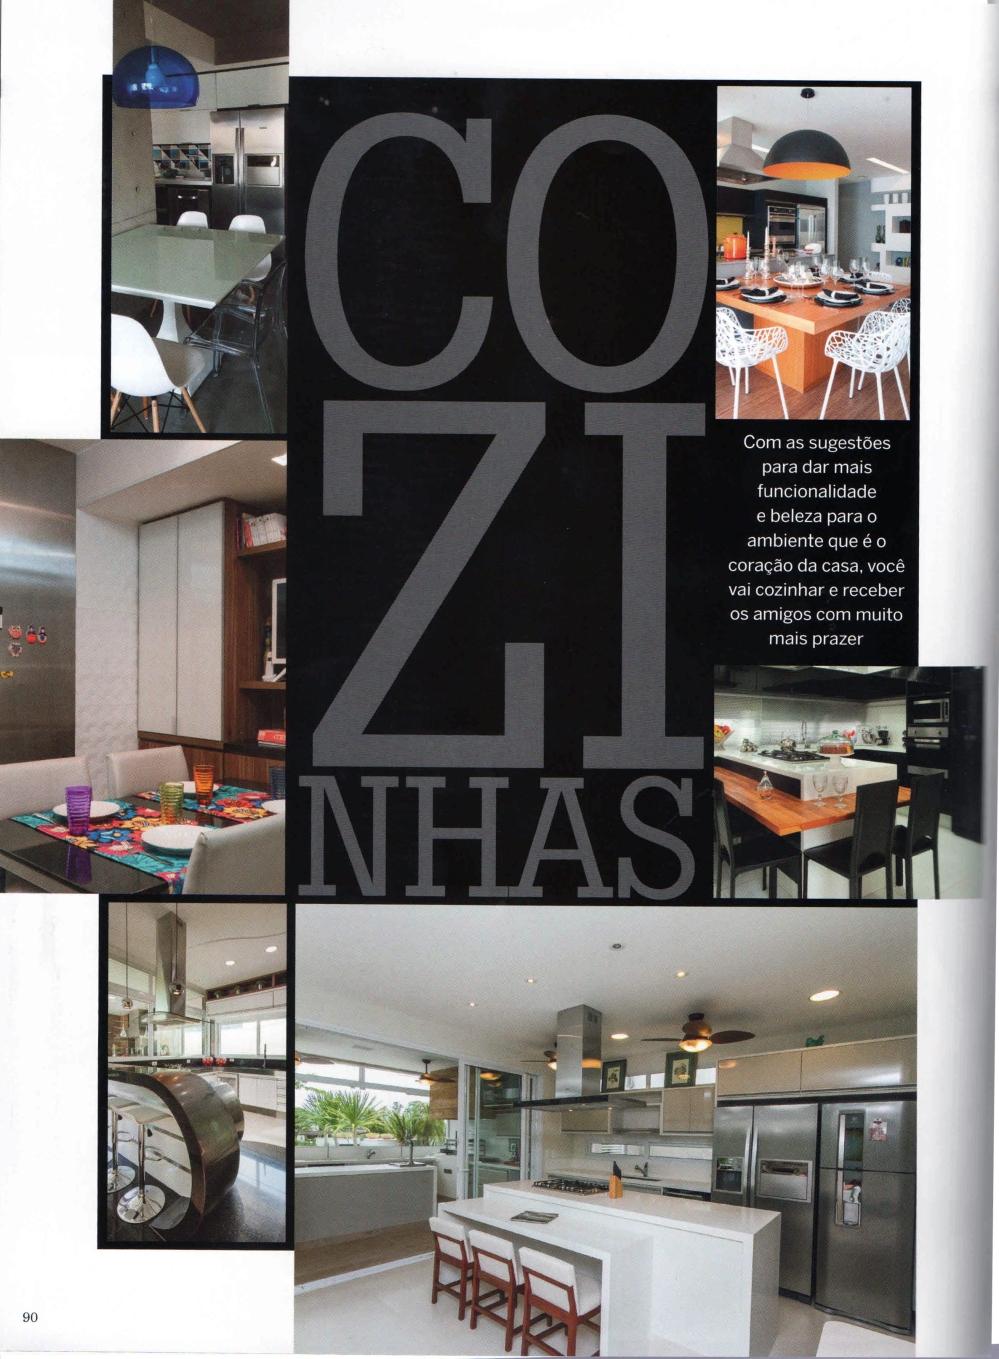 Arquiteto Aquiles Nicolas Kilaris Revista Guia 1001 ideias (10)